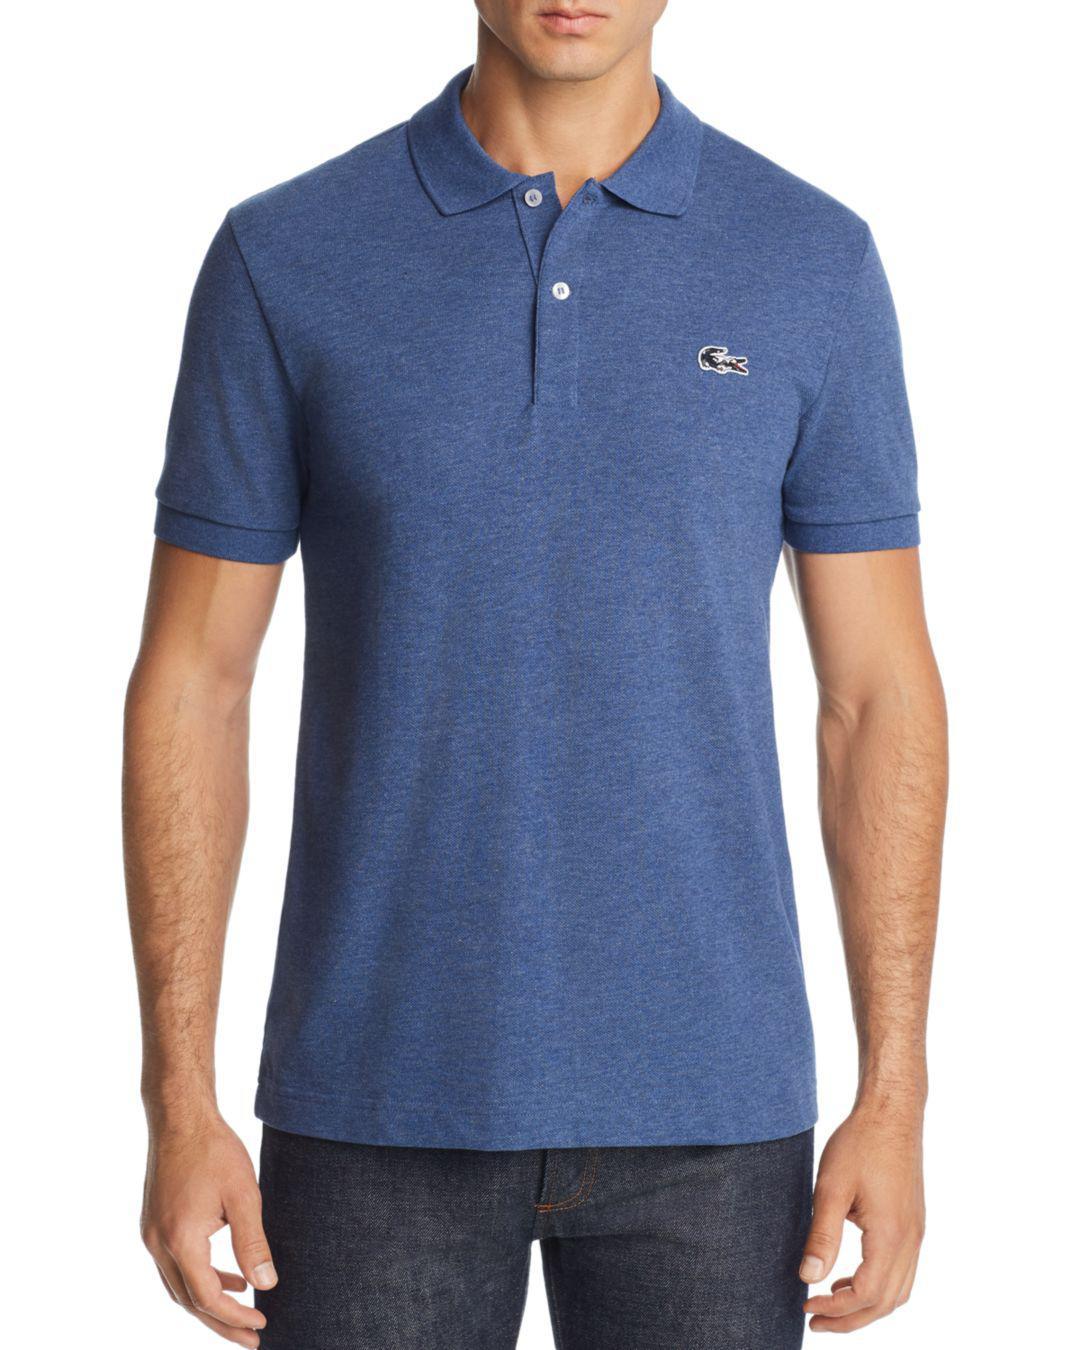 b3b6c279c51 Lyst - Lacoste Camouflage Crocodile Logo Polo Shirt in Blue for Men